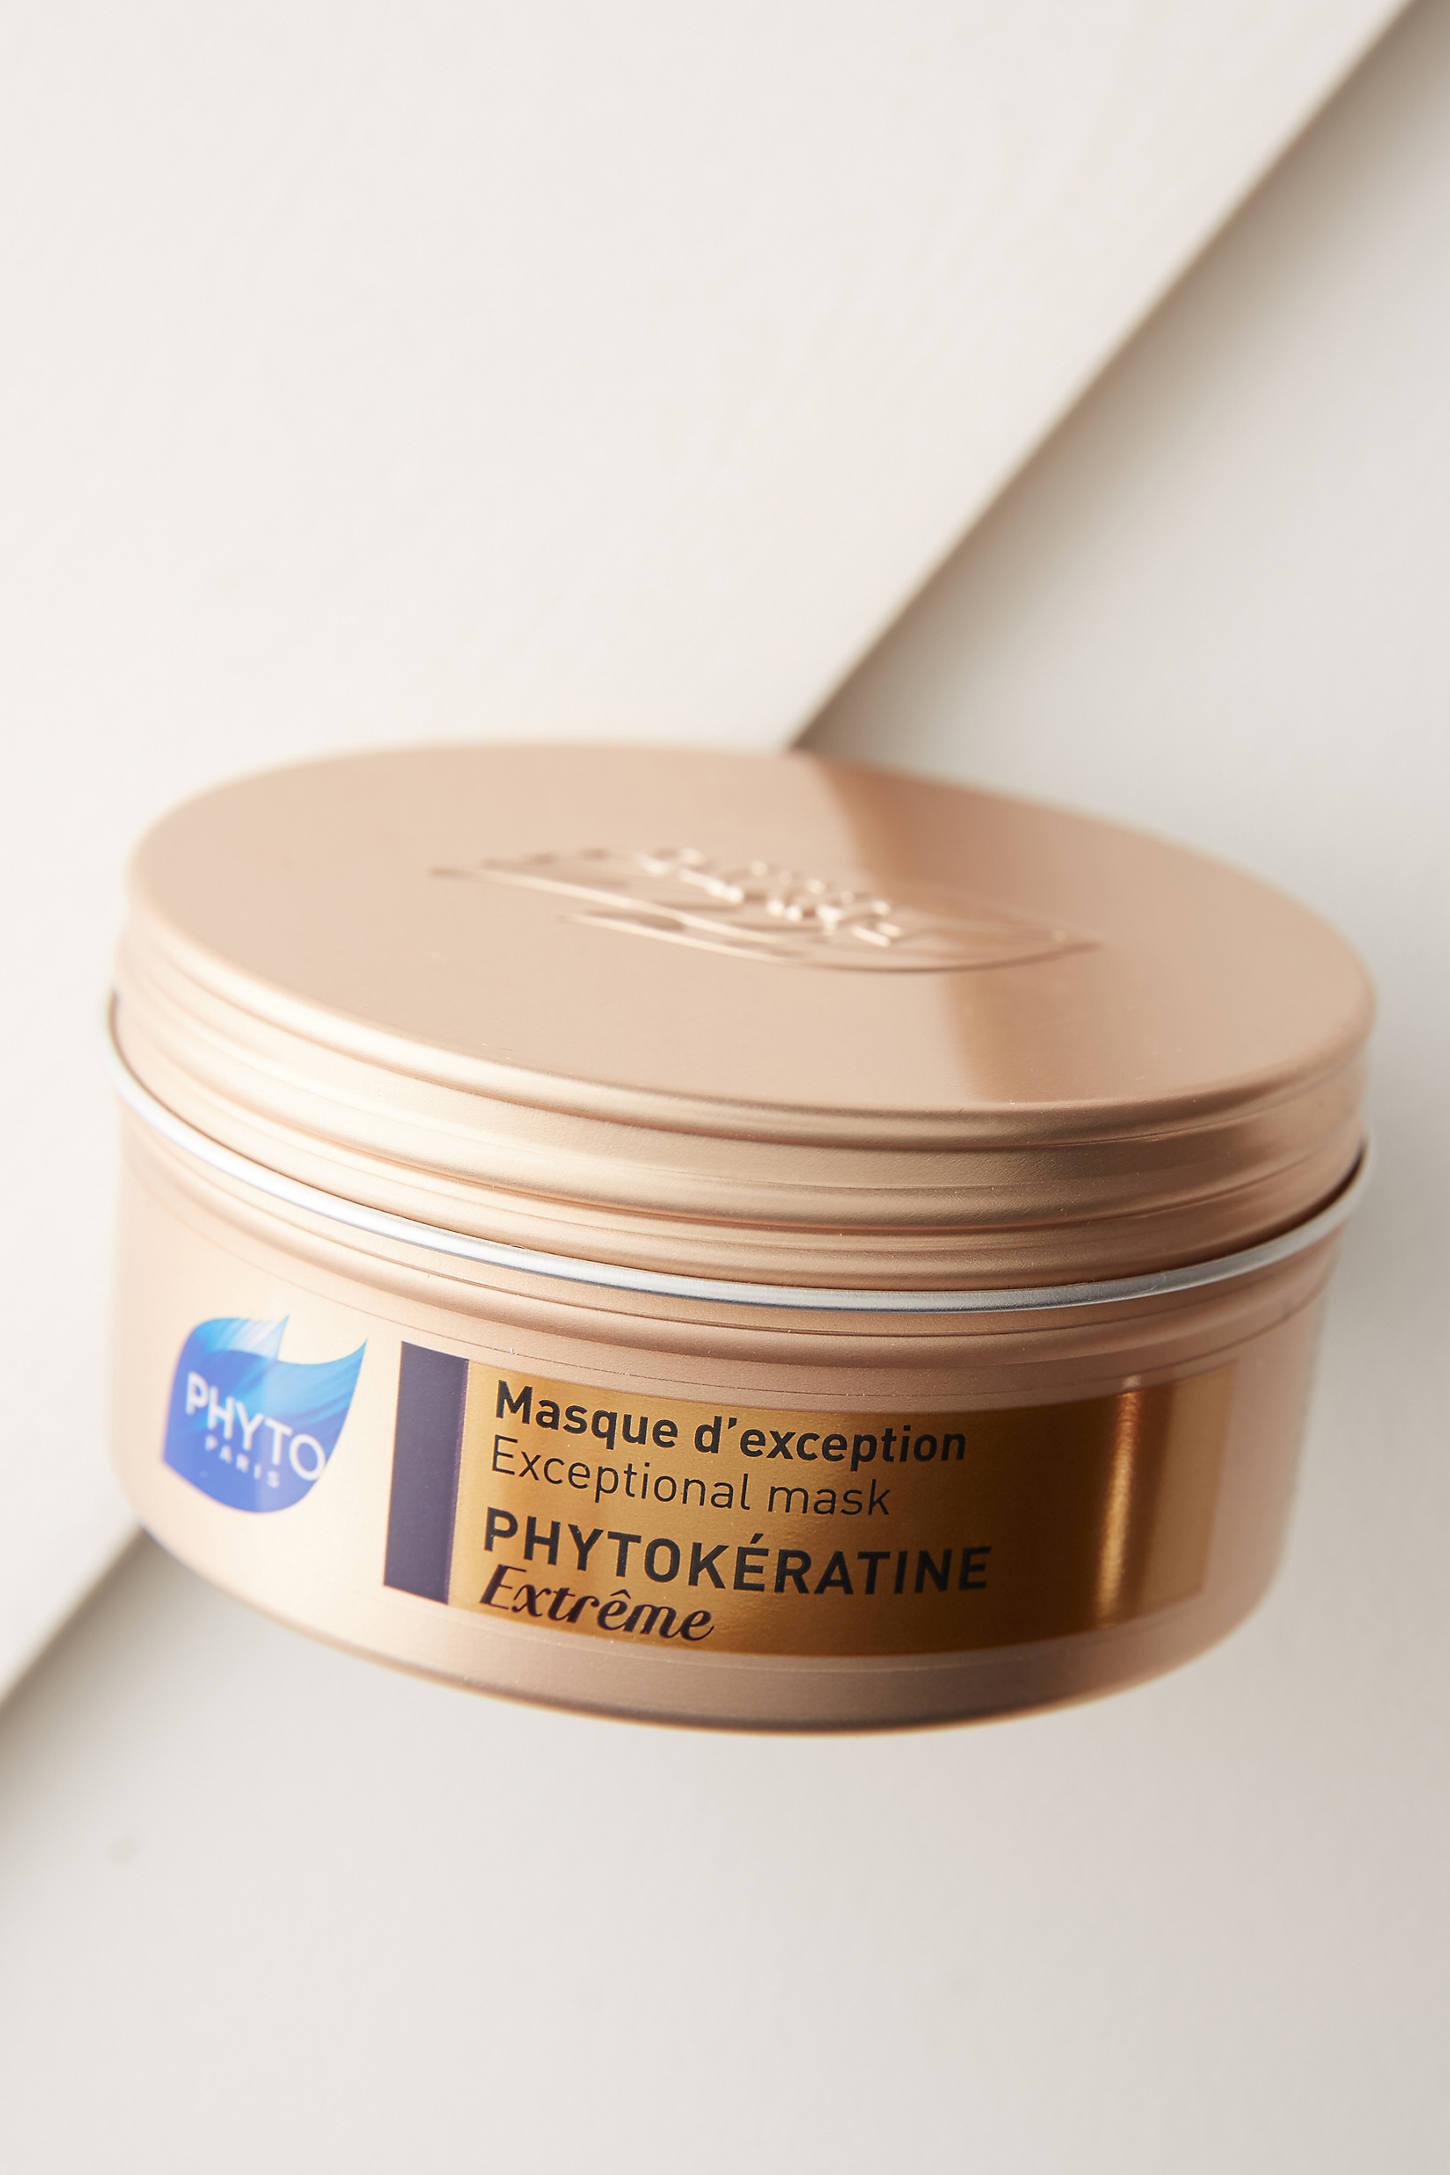 Phyto Phytokeratin Extreme Exceptional Mask